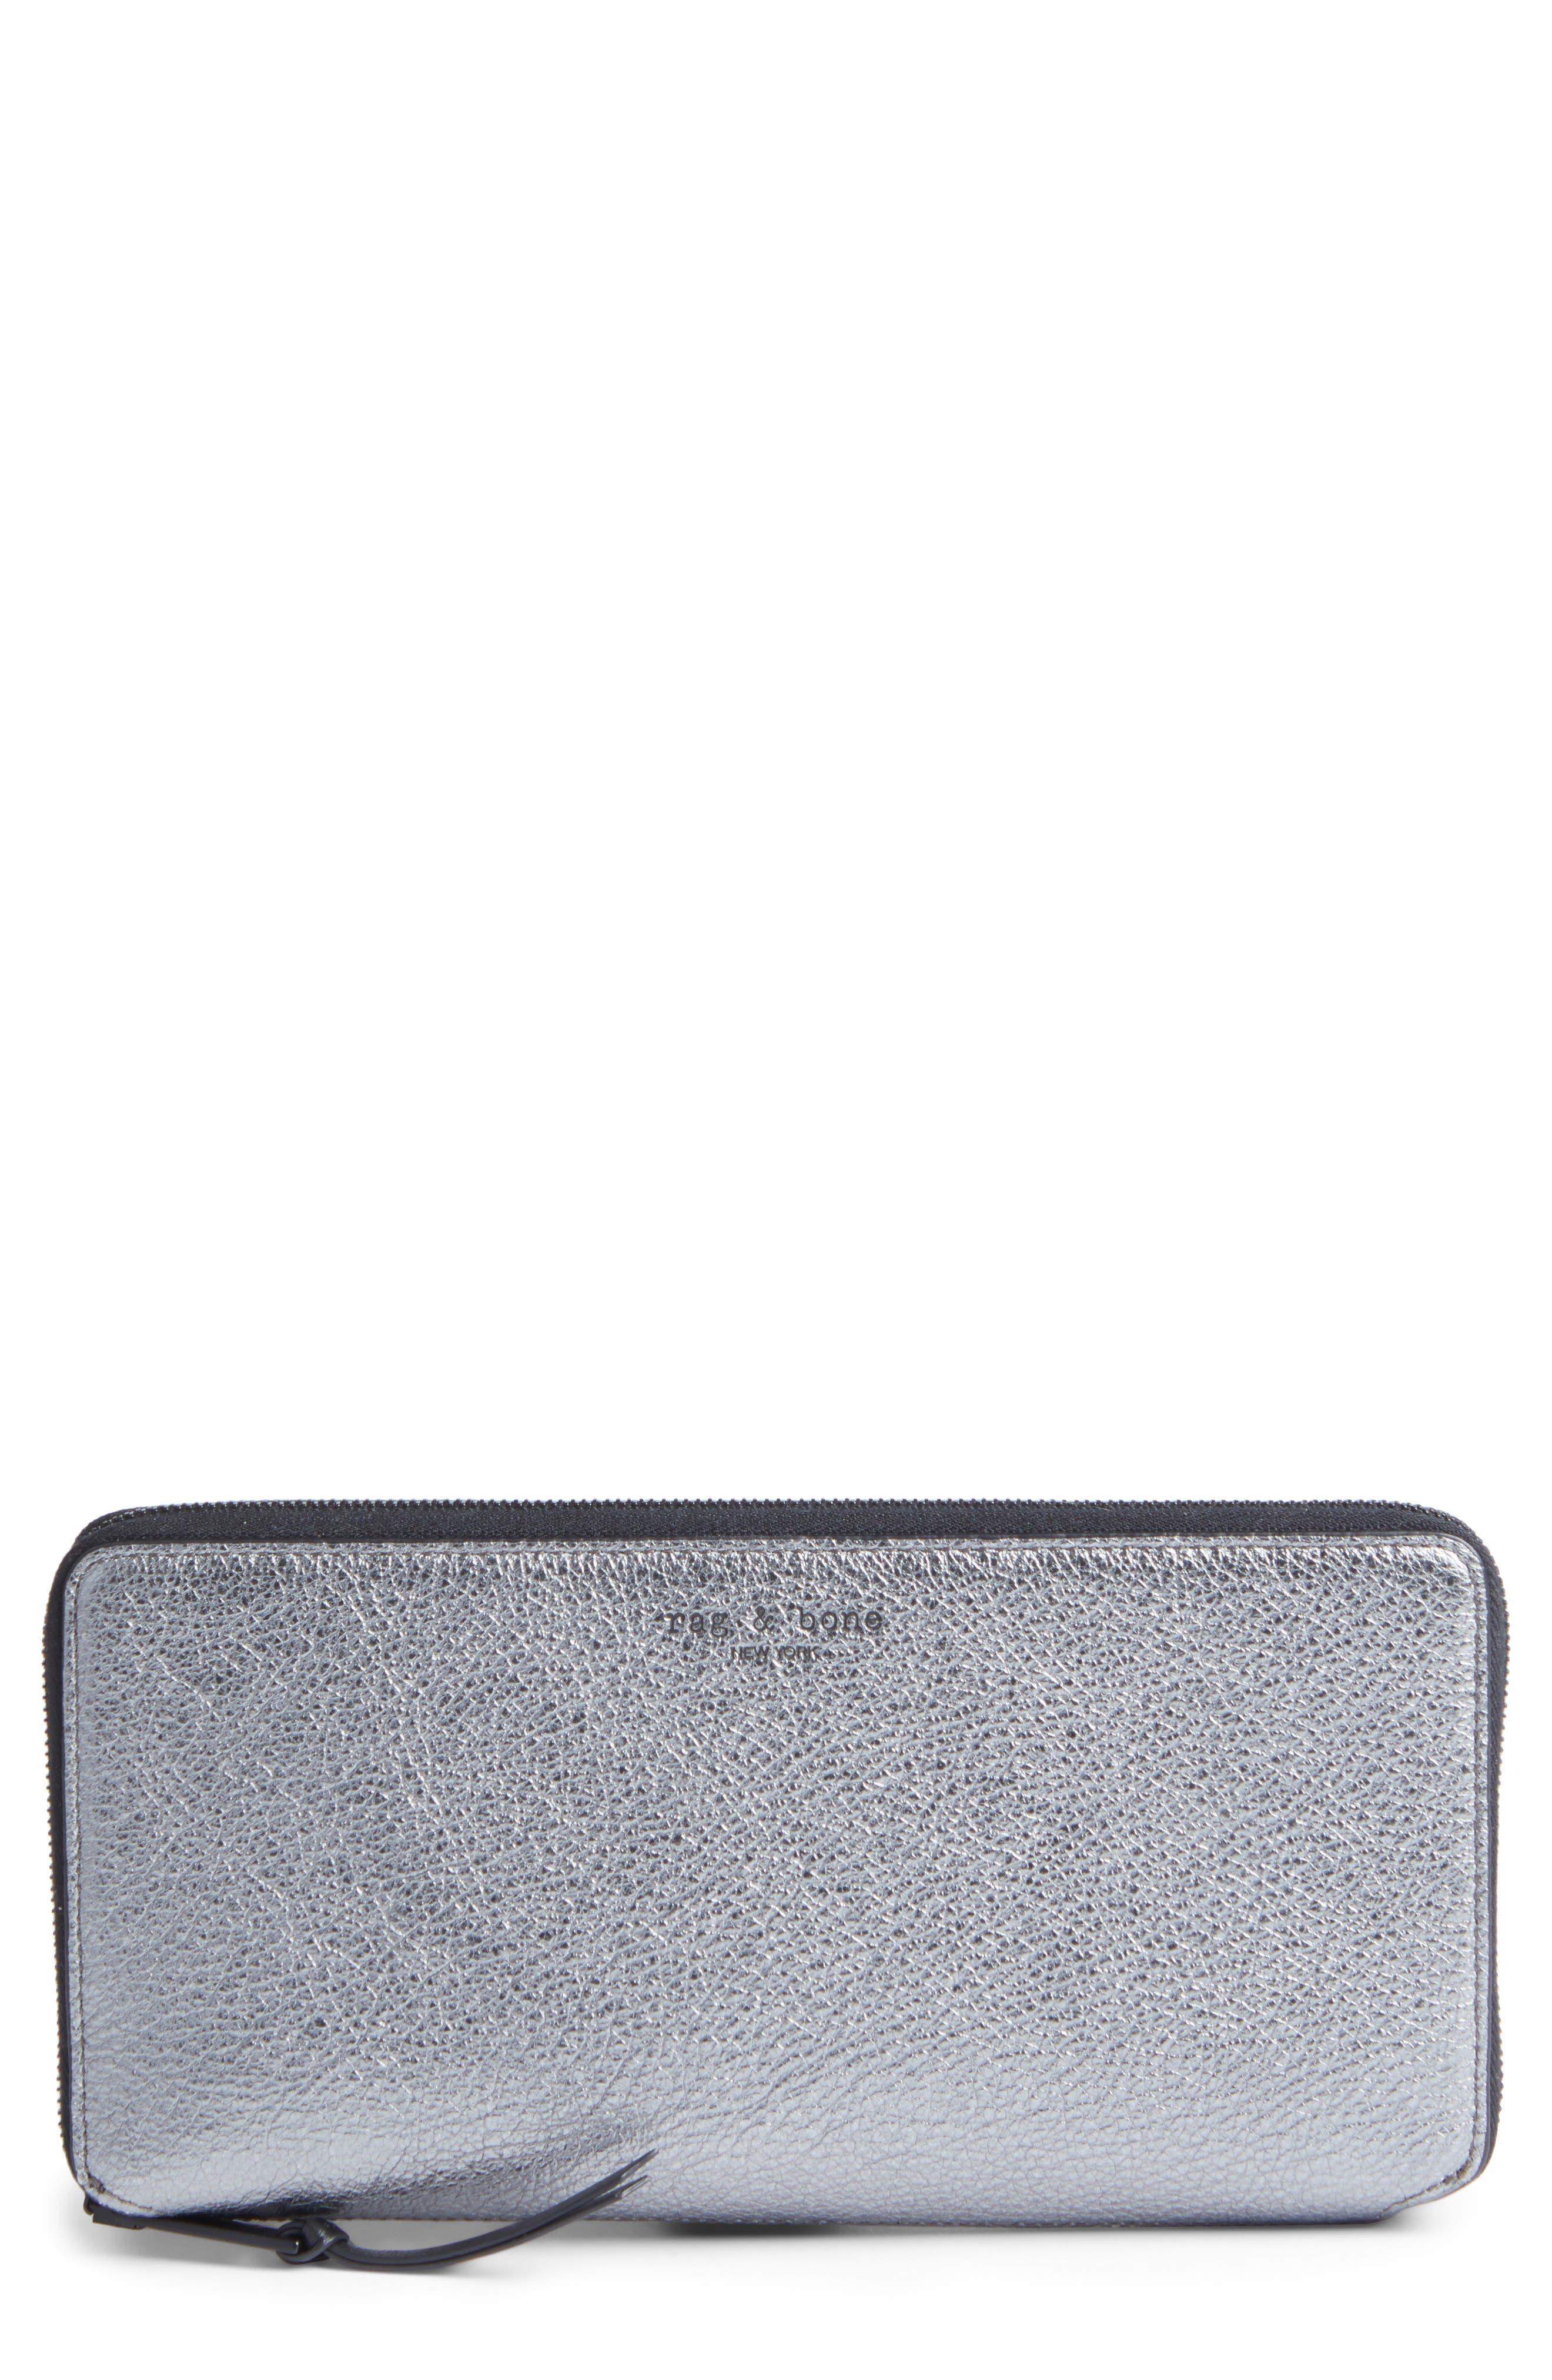 Metallic Leather Zip-Around Wallet,                             Main thumbnail 1, color,                             Gunmetal